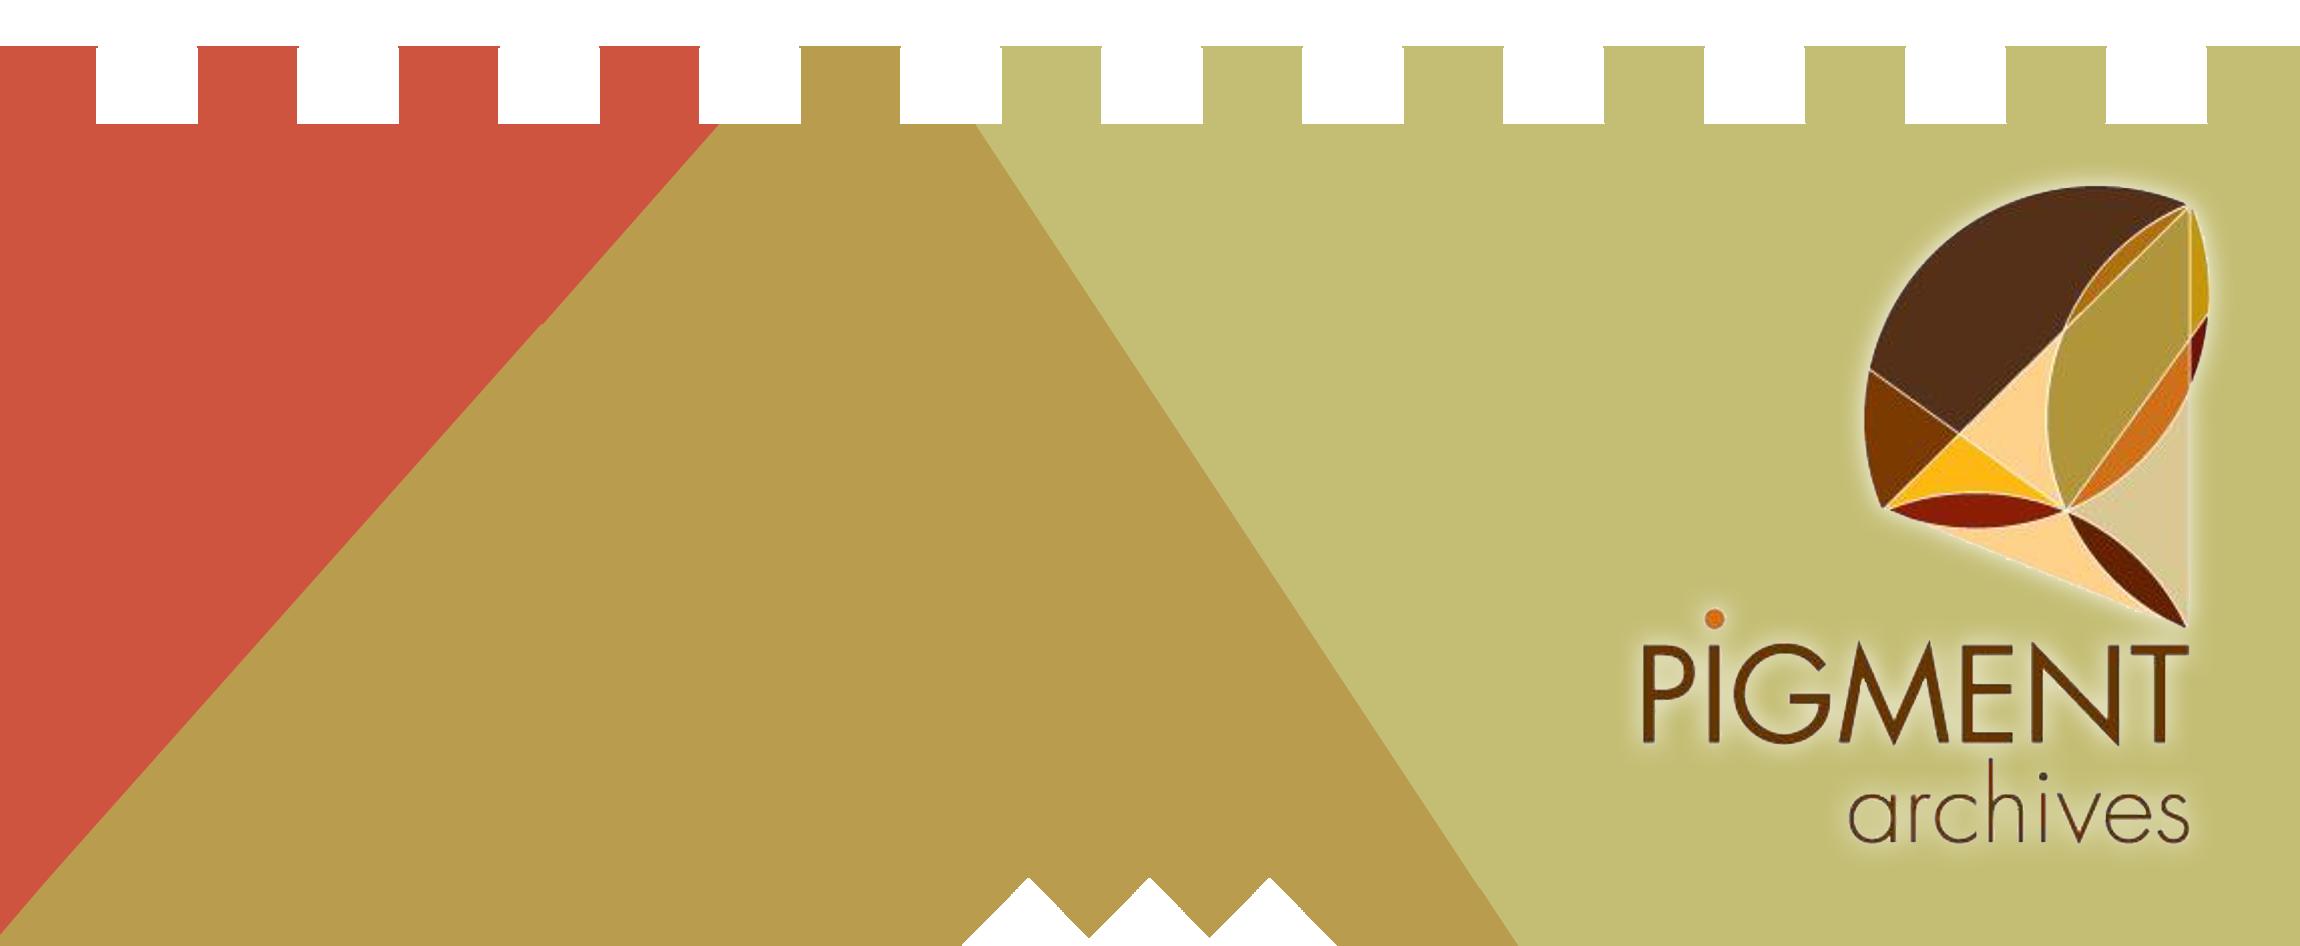 topdesignedbanner5555_pigment_update